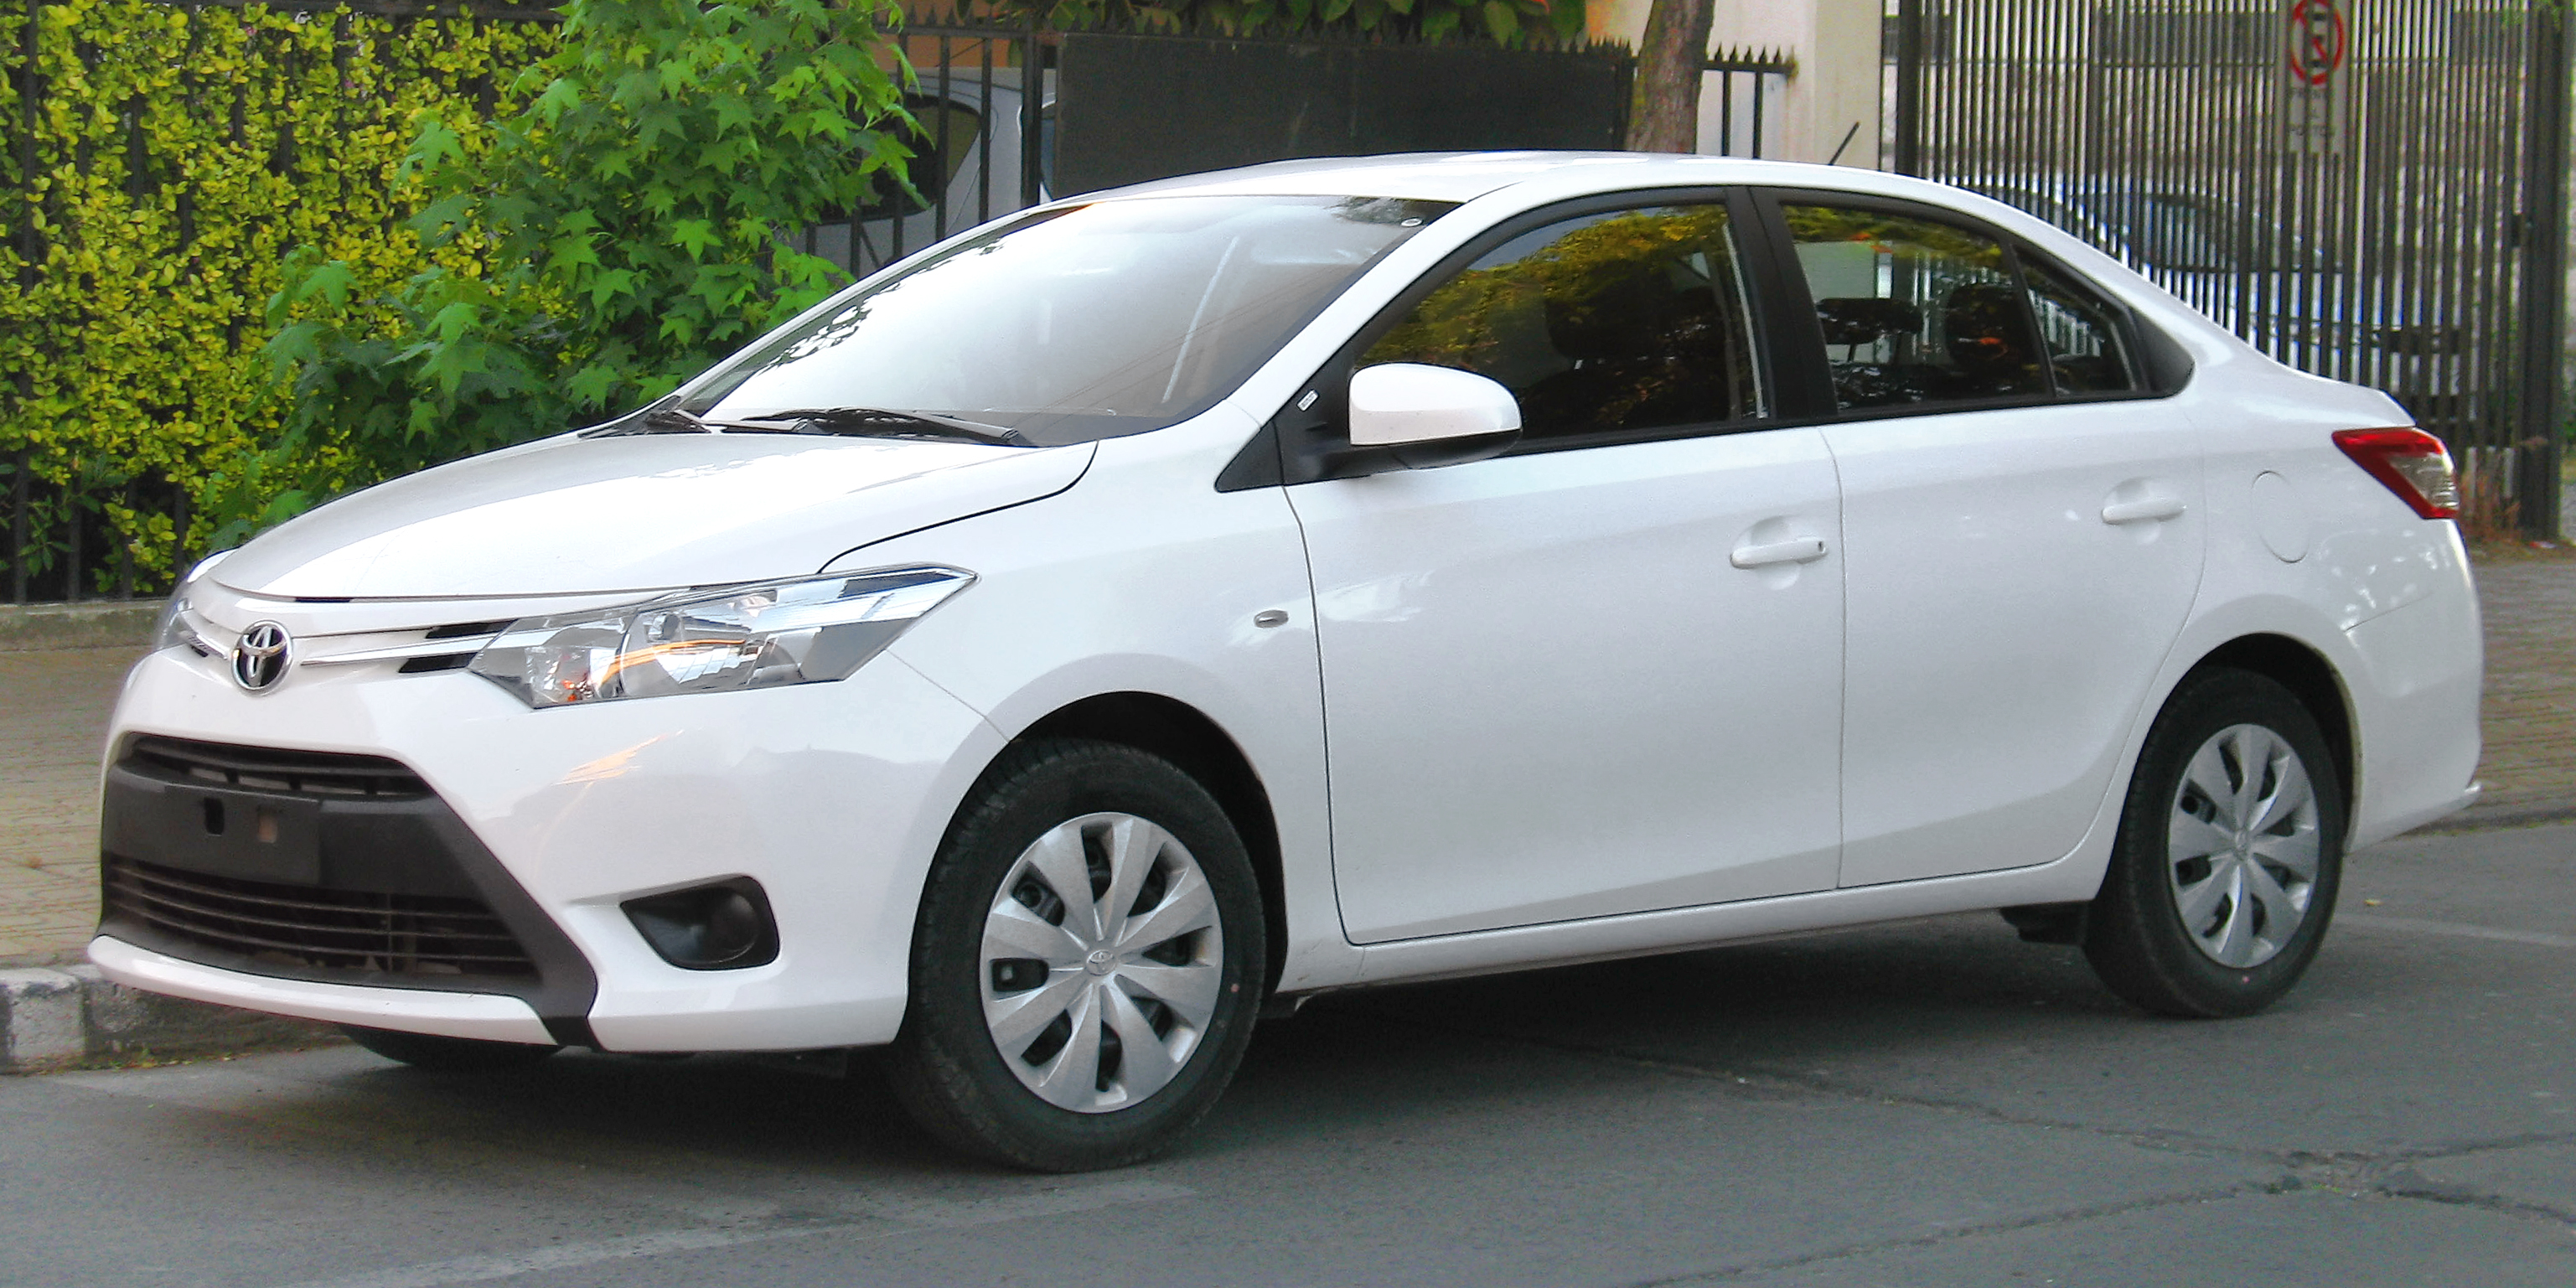 File:2014 Toyota Yaris 1.5 XLi in Chile.jpg - Wikimedia Commons